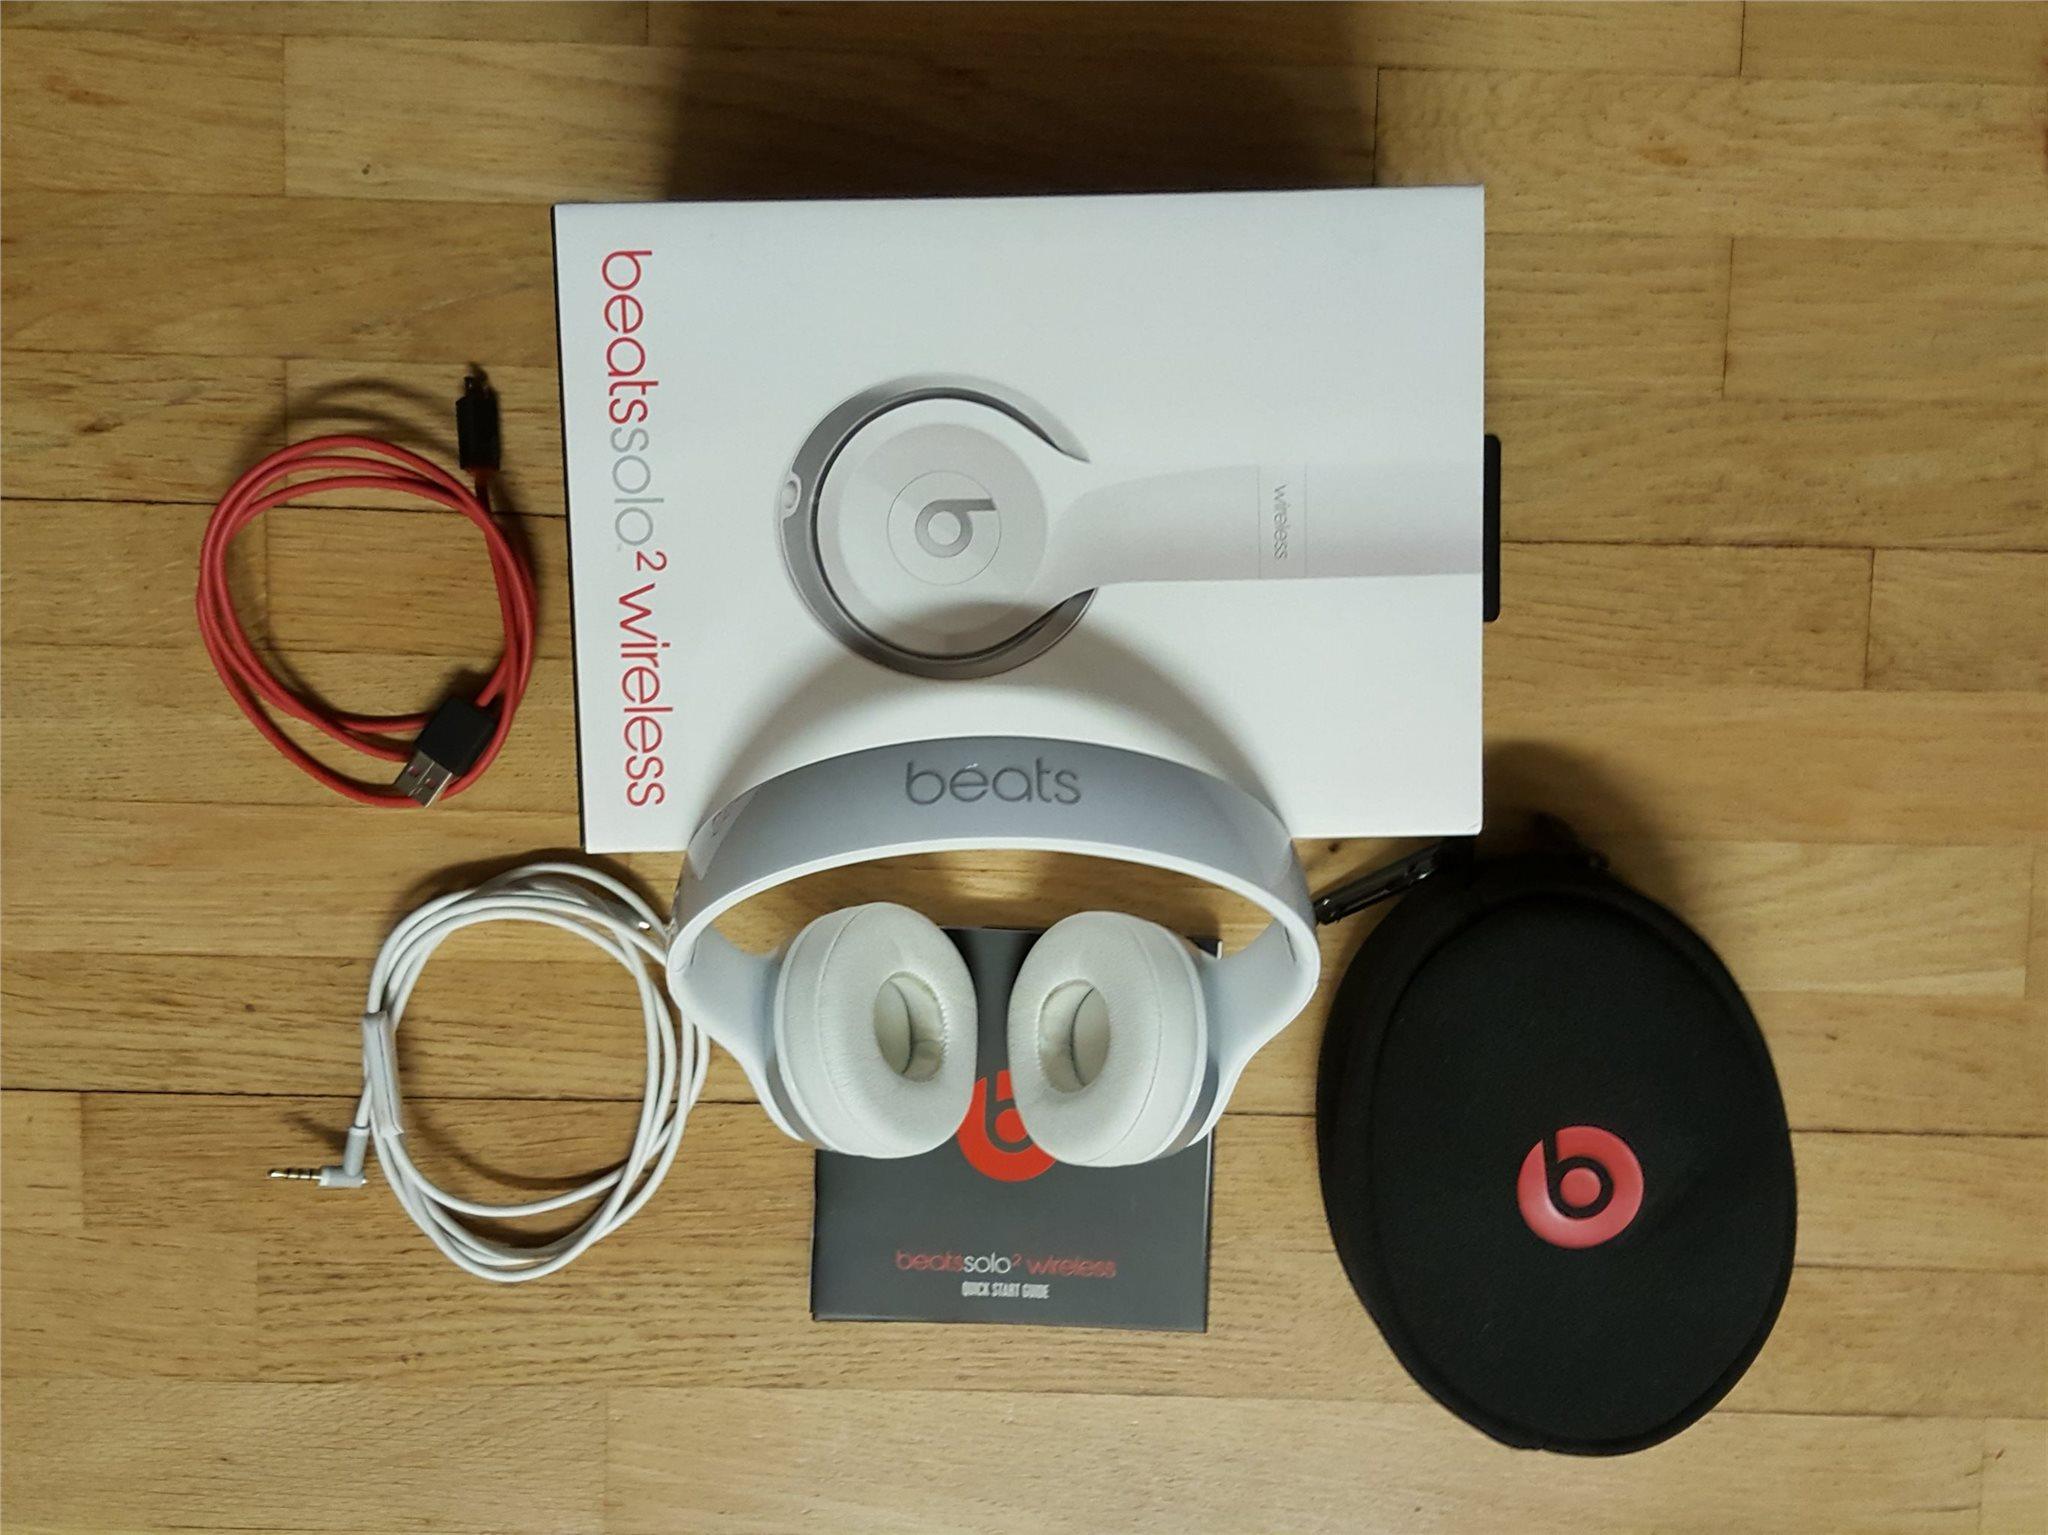 Hörlurar Beats by Dr.Dre Beats Solo2 Wireless (338484483) ᐈ Köp på ... 9174ae7c00d1d